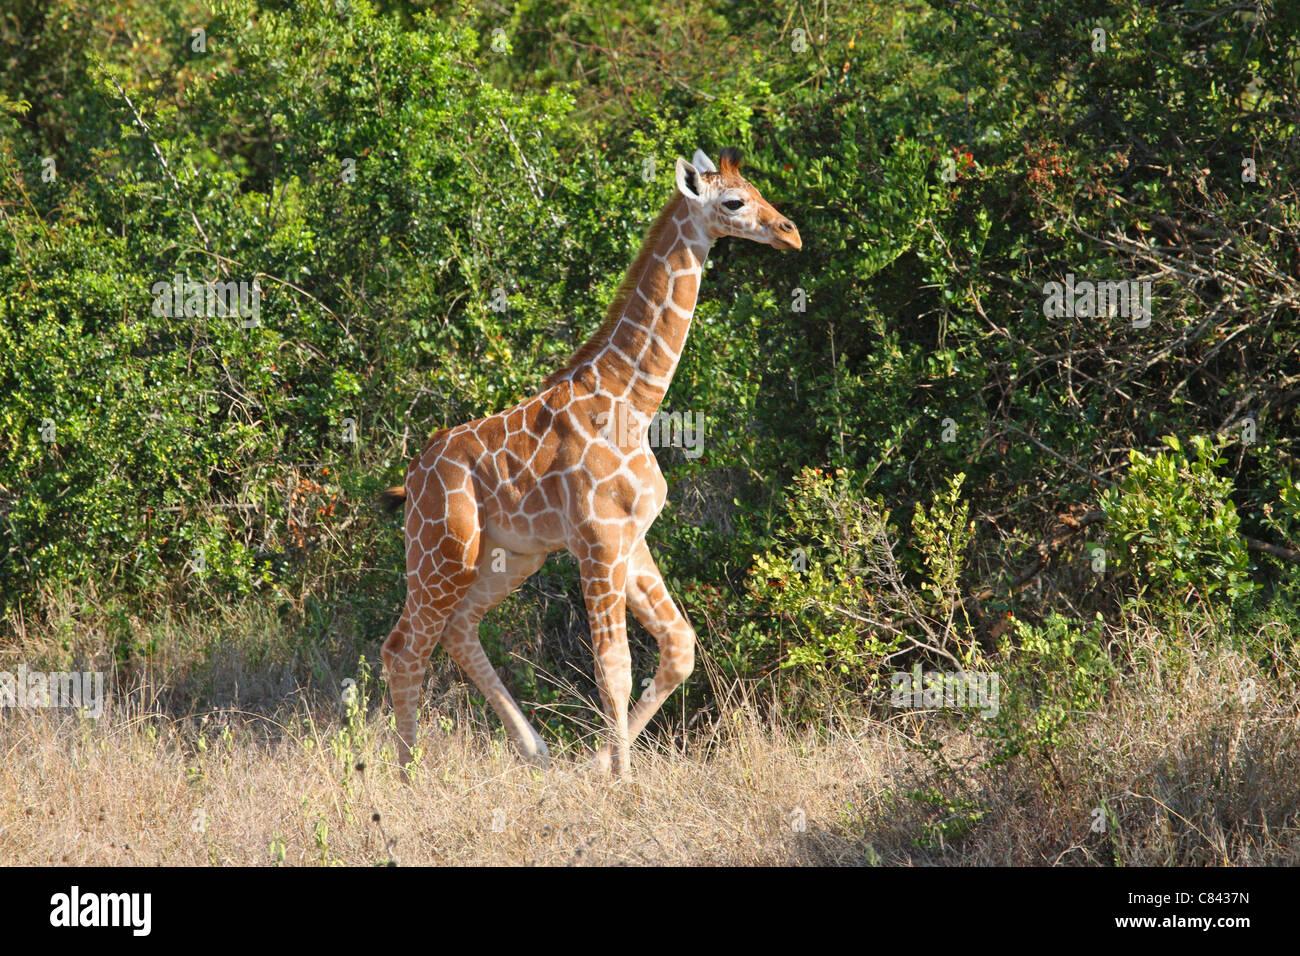 Jirafa reticulada - cub / Giraffa camelopardalis reticulata Foto de stock